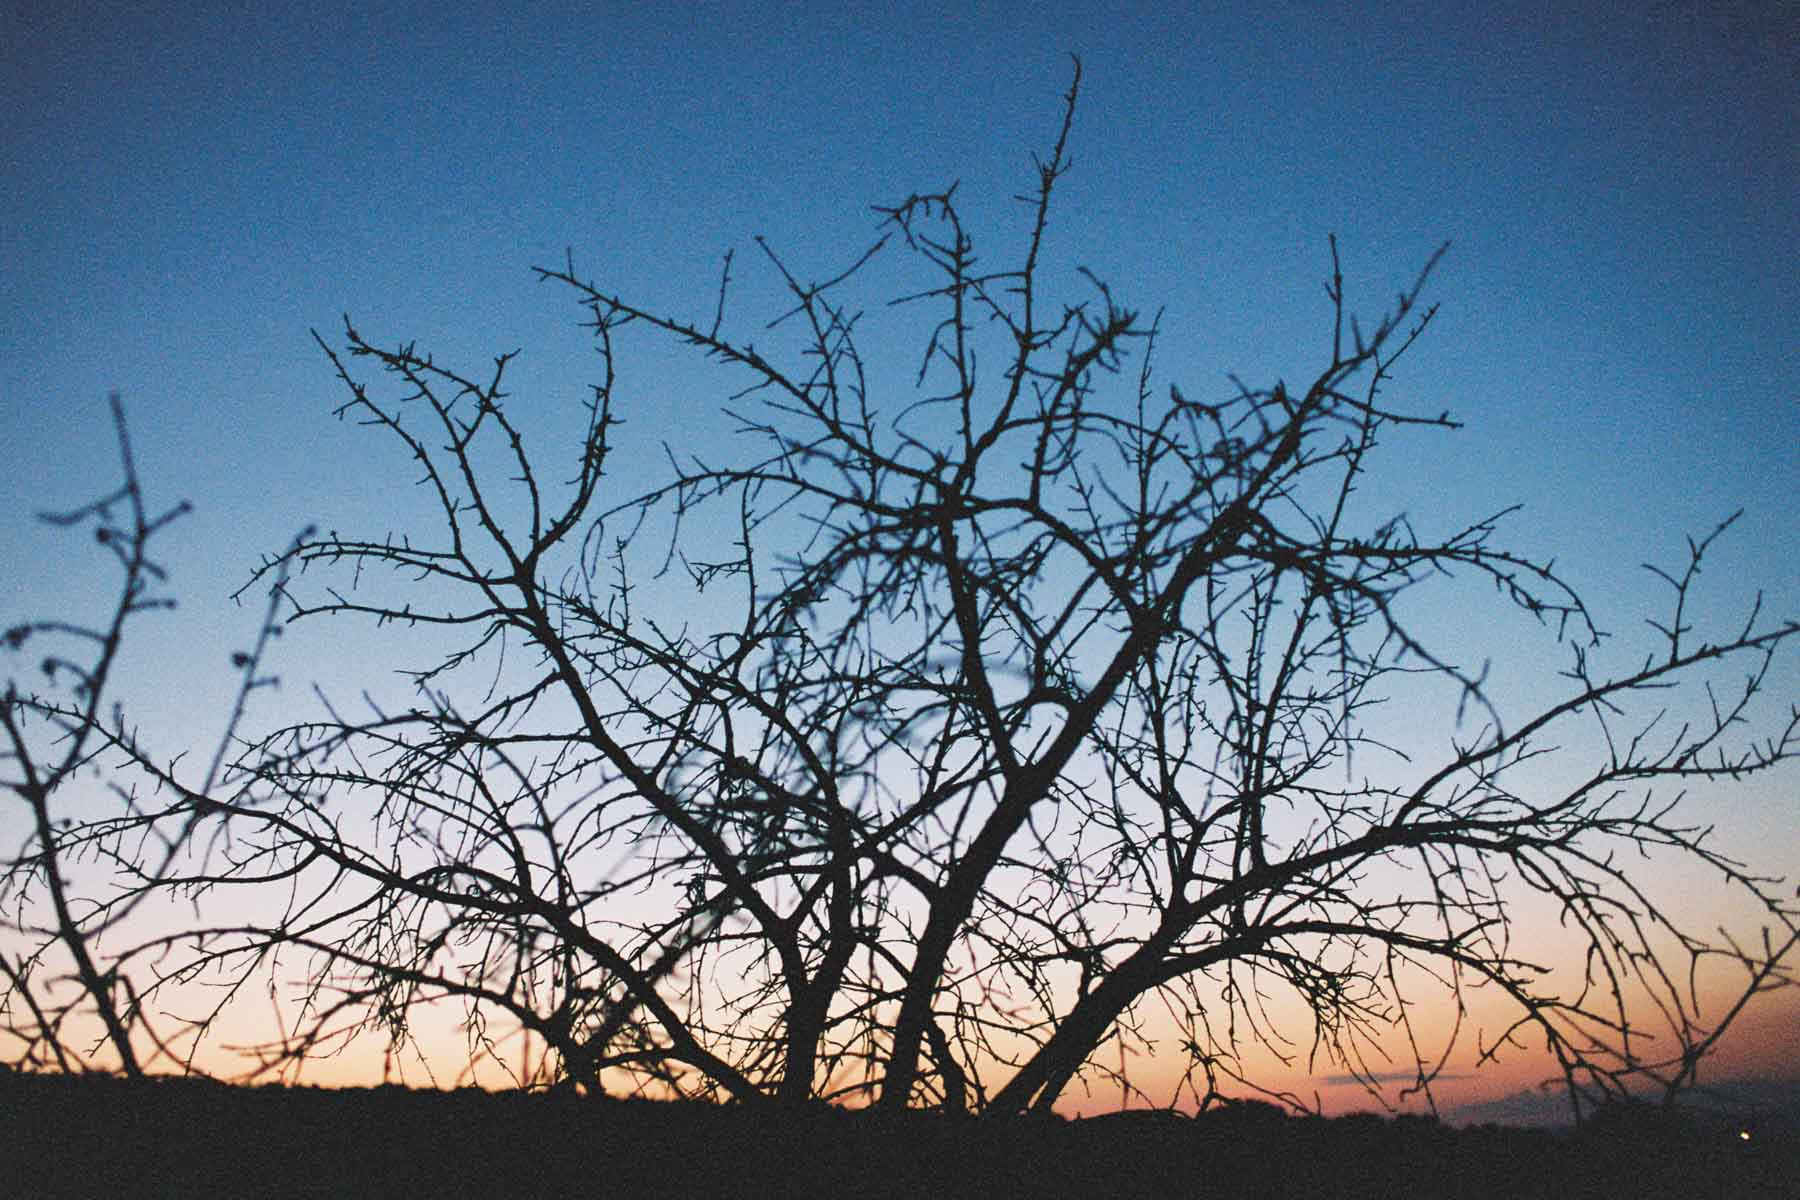 Baumsilhouette im Sonnenuntergang